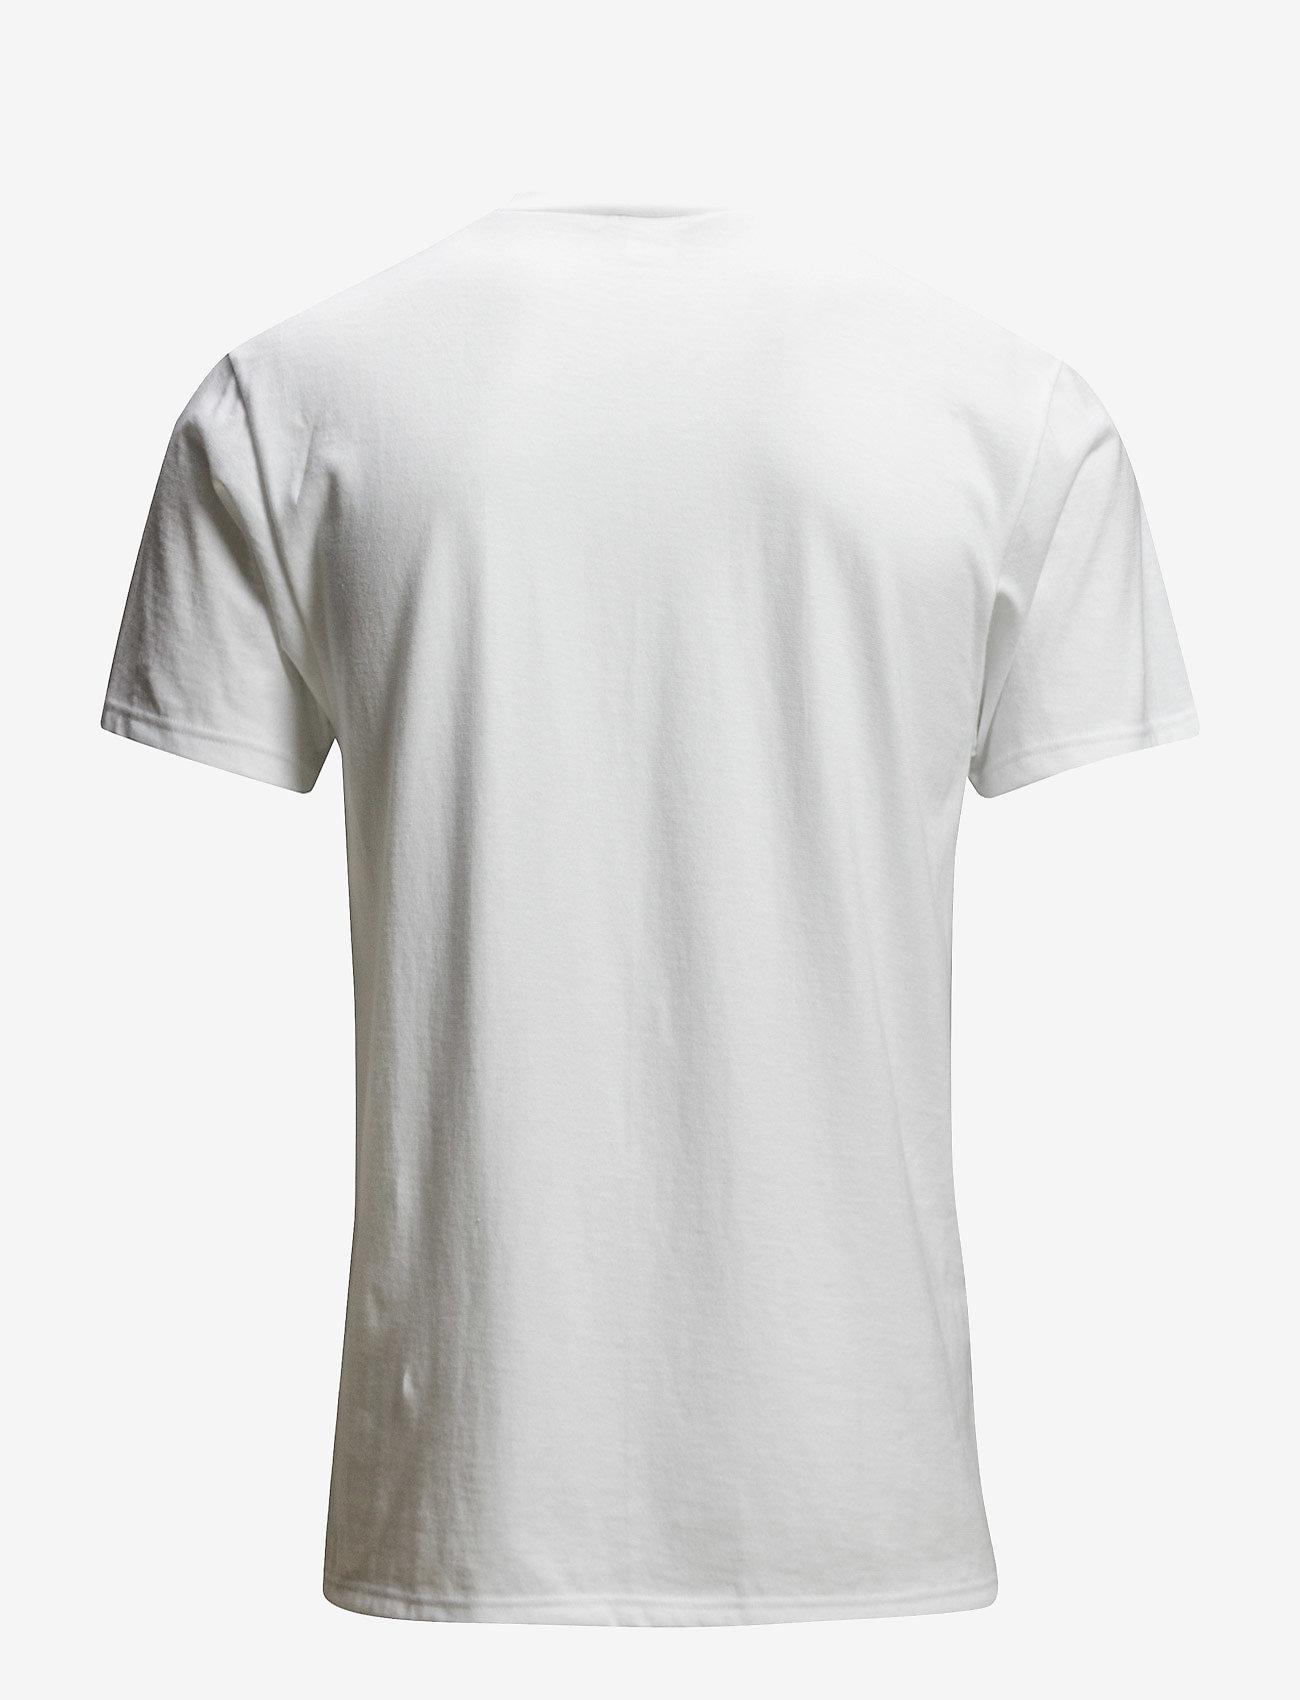 Dovre - Dovre T-shirts V-neck - t-krekli ar īsām piedurknēm - hvid - 0